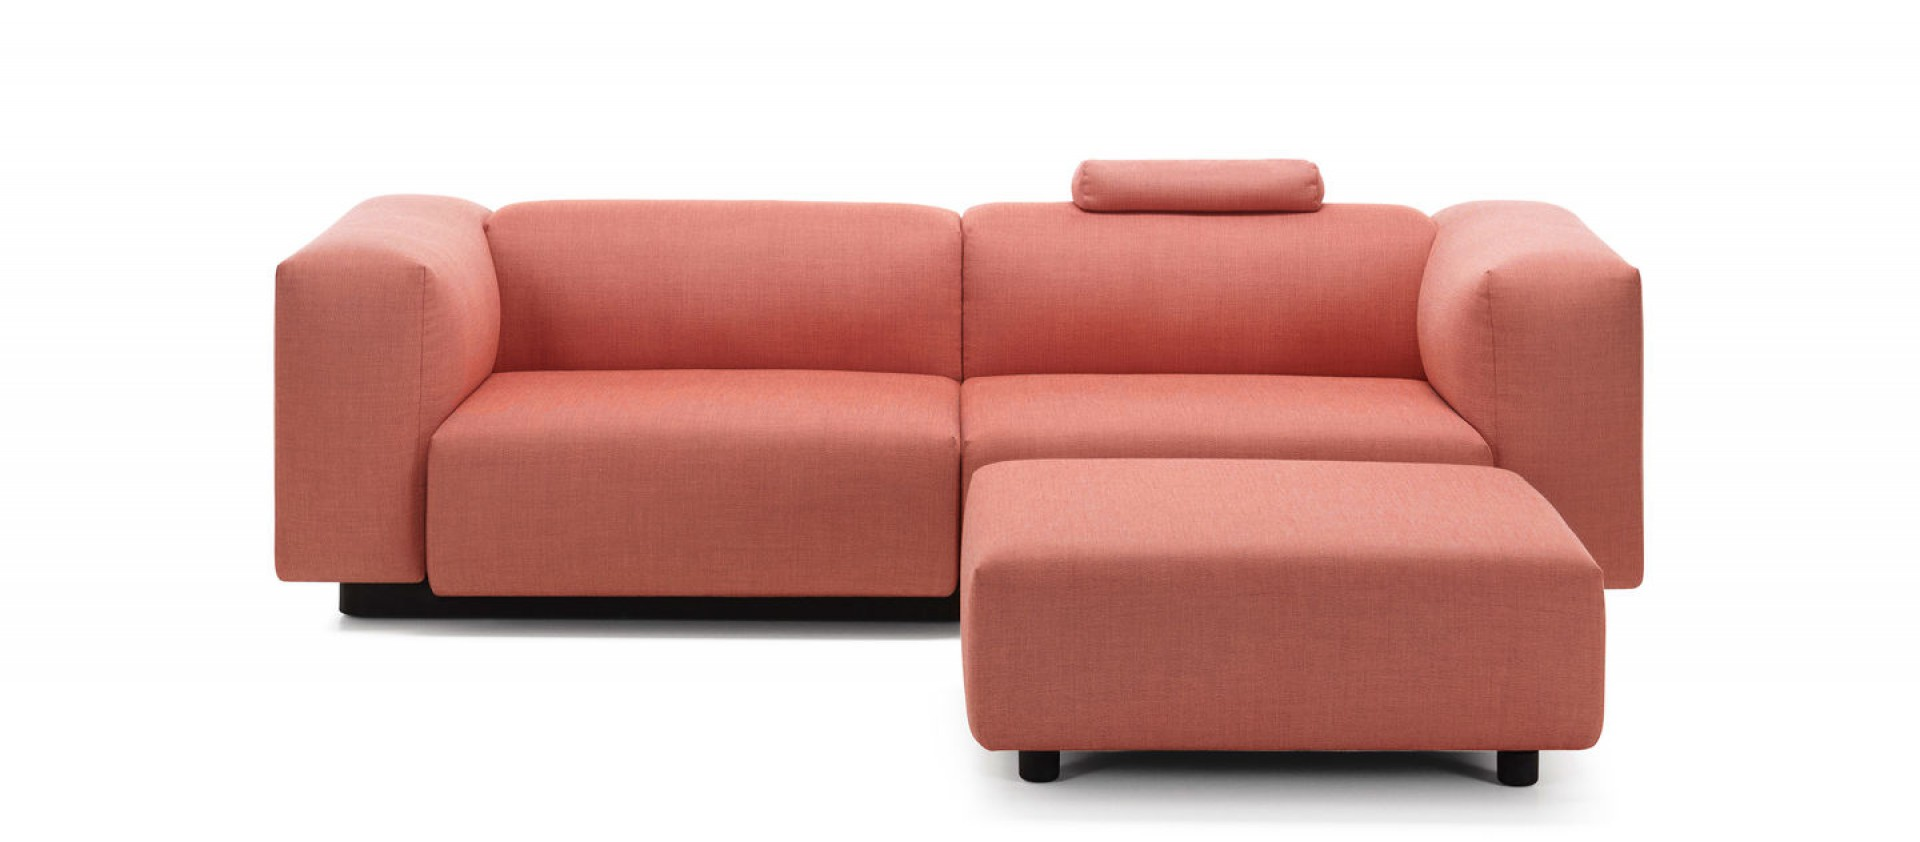 "Sofa ""Soft Modular"" firmy Vitra. Projekt: Jasper Morrison. Fot. Vitra"